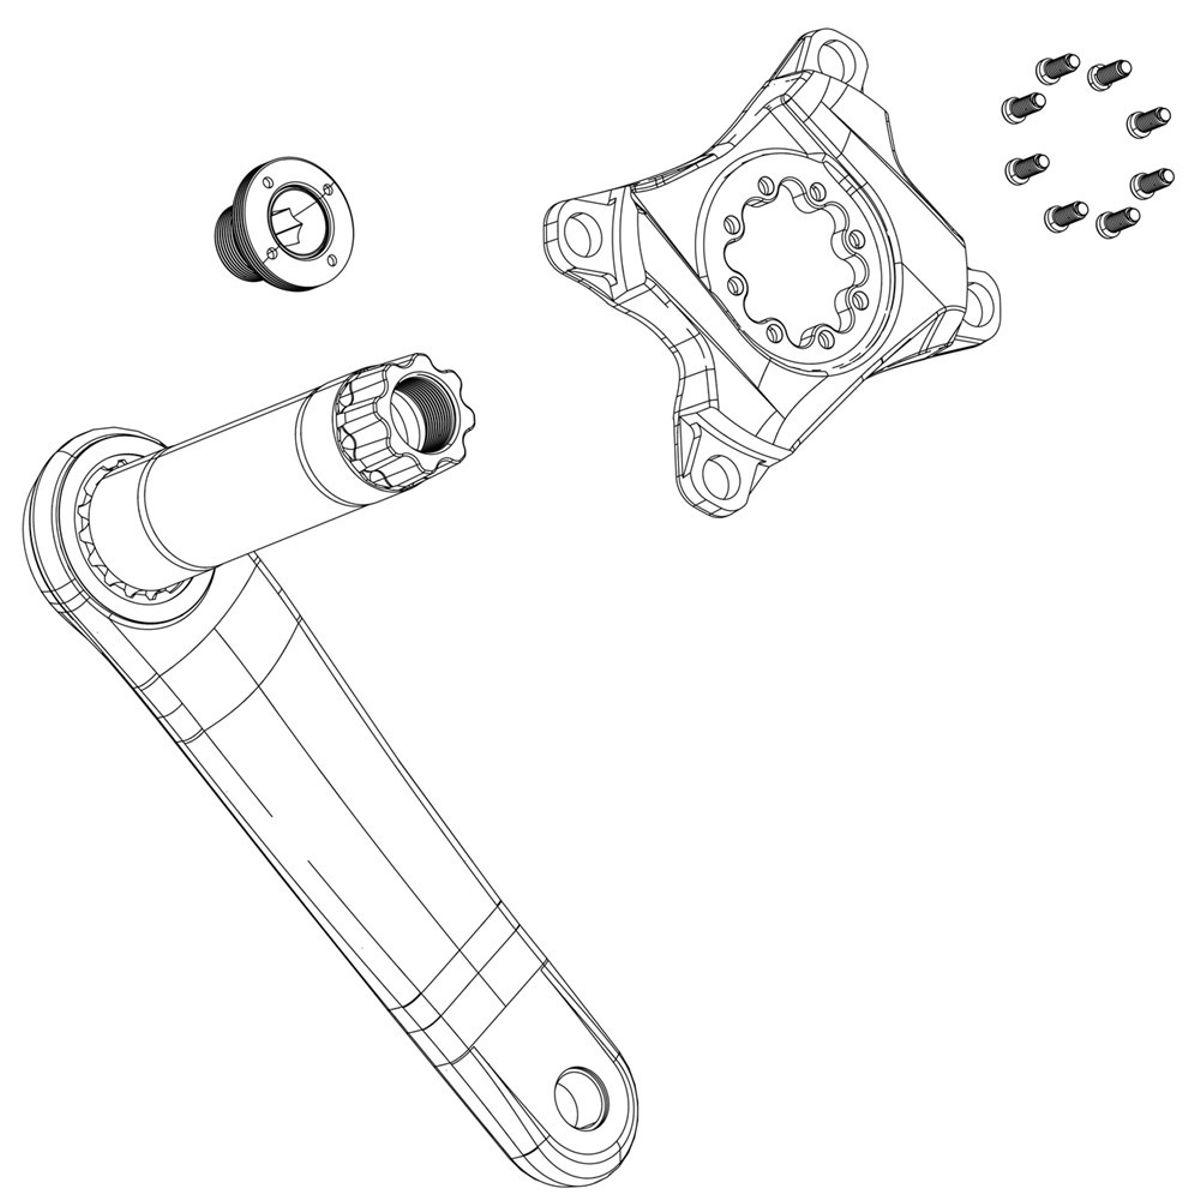 TRAPD SRAM BOUT M18/M30 DUB ALM LN